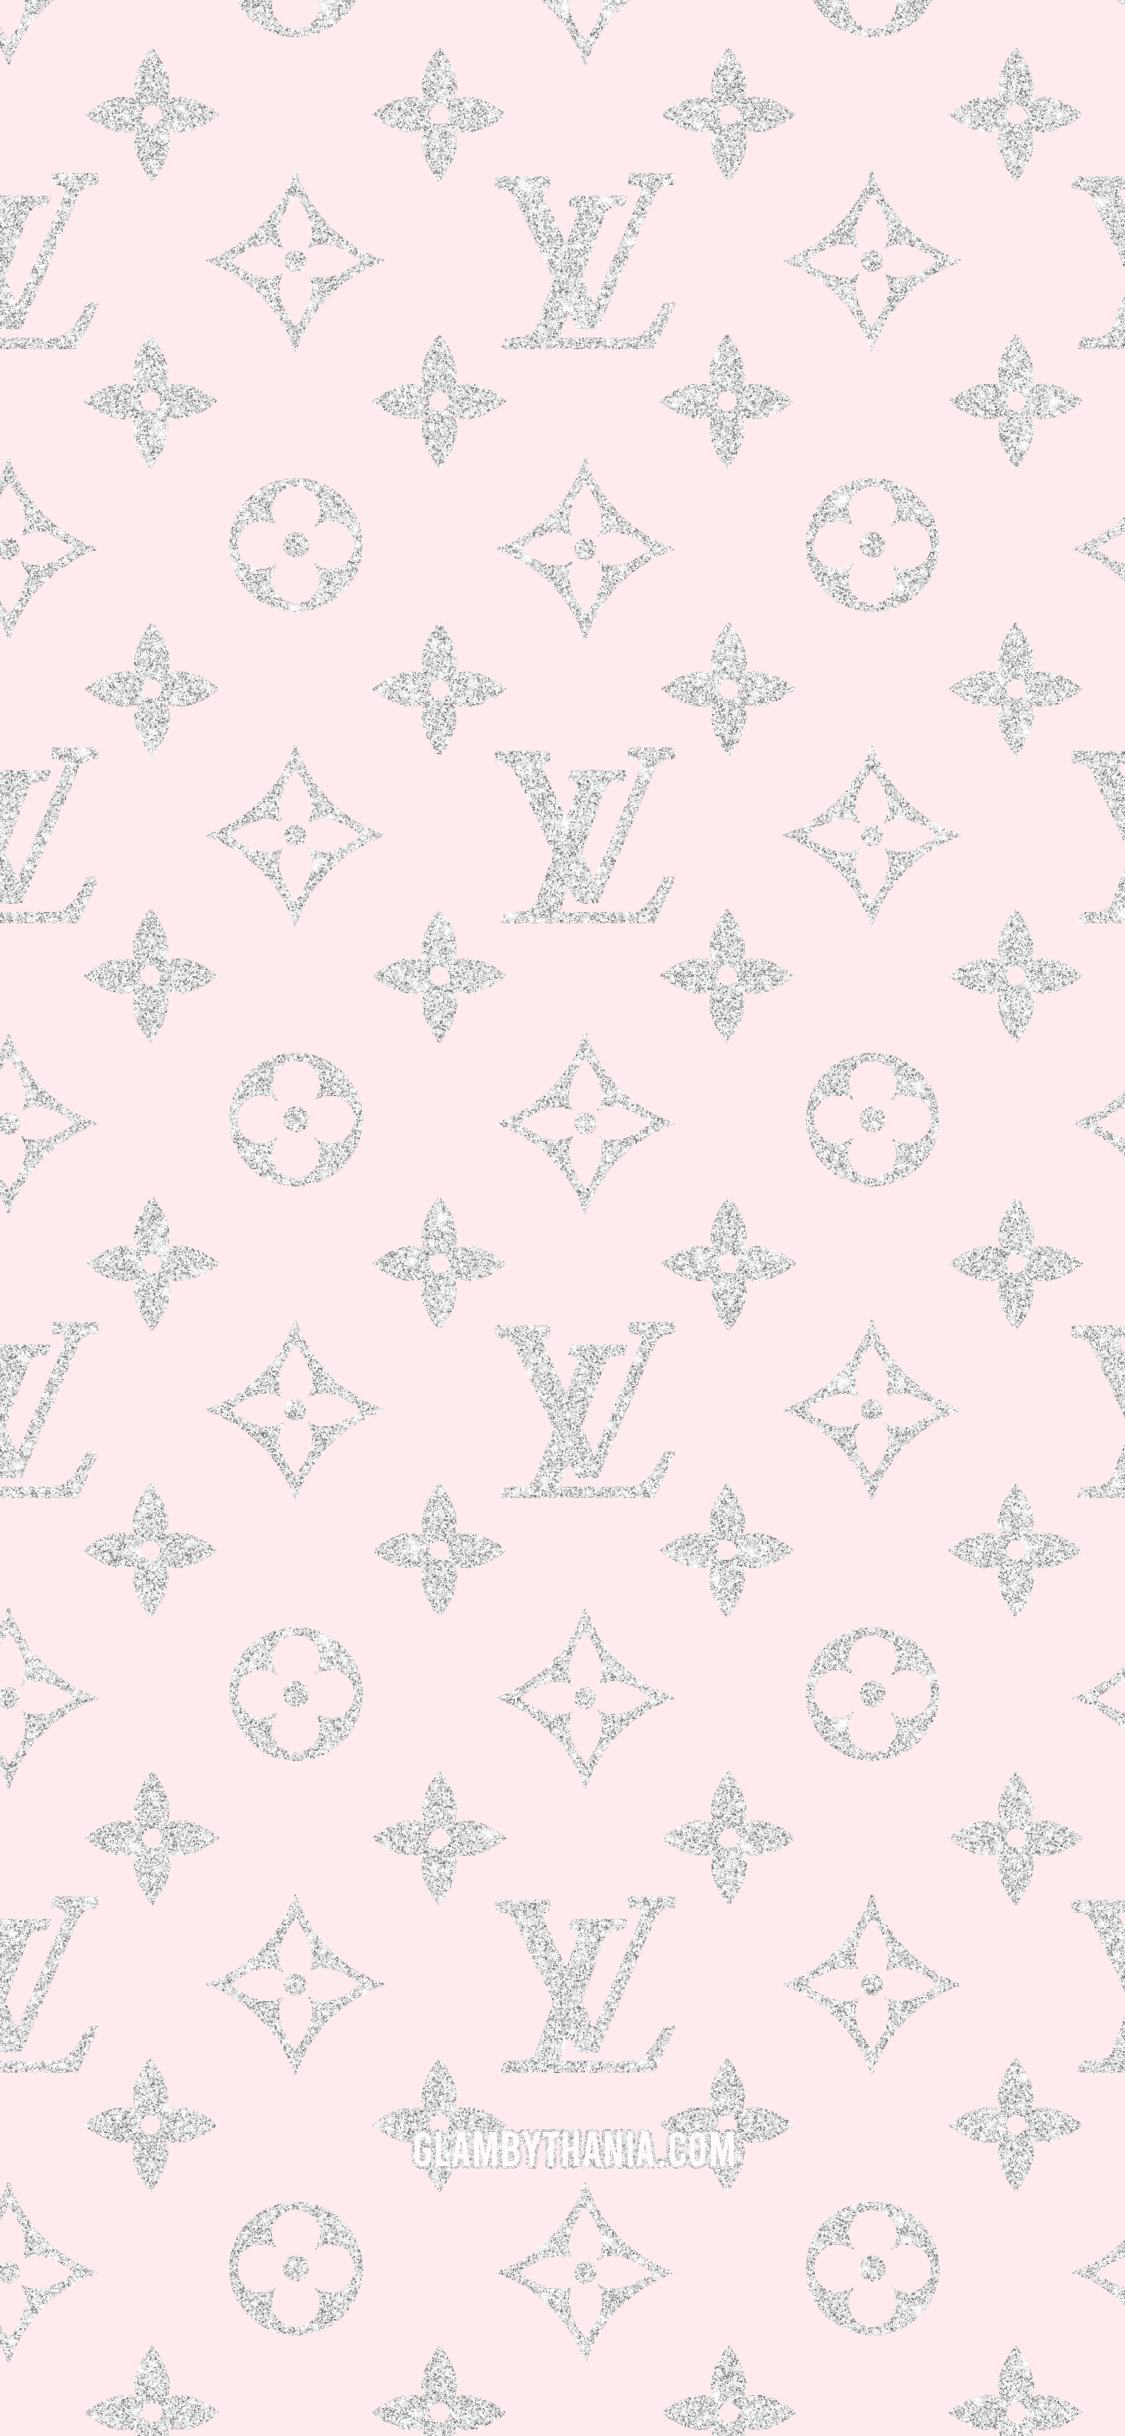 Iphone Wallpaper Girly In 2020 Iphone Wallpaper Girly Butterfly Wallpaper Iphone Iphone Wallpaper Tumblr Aesthetic